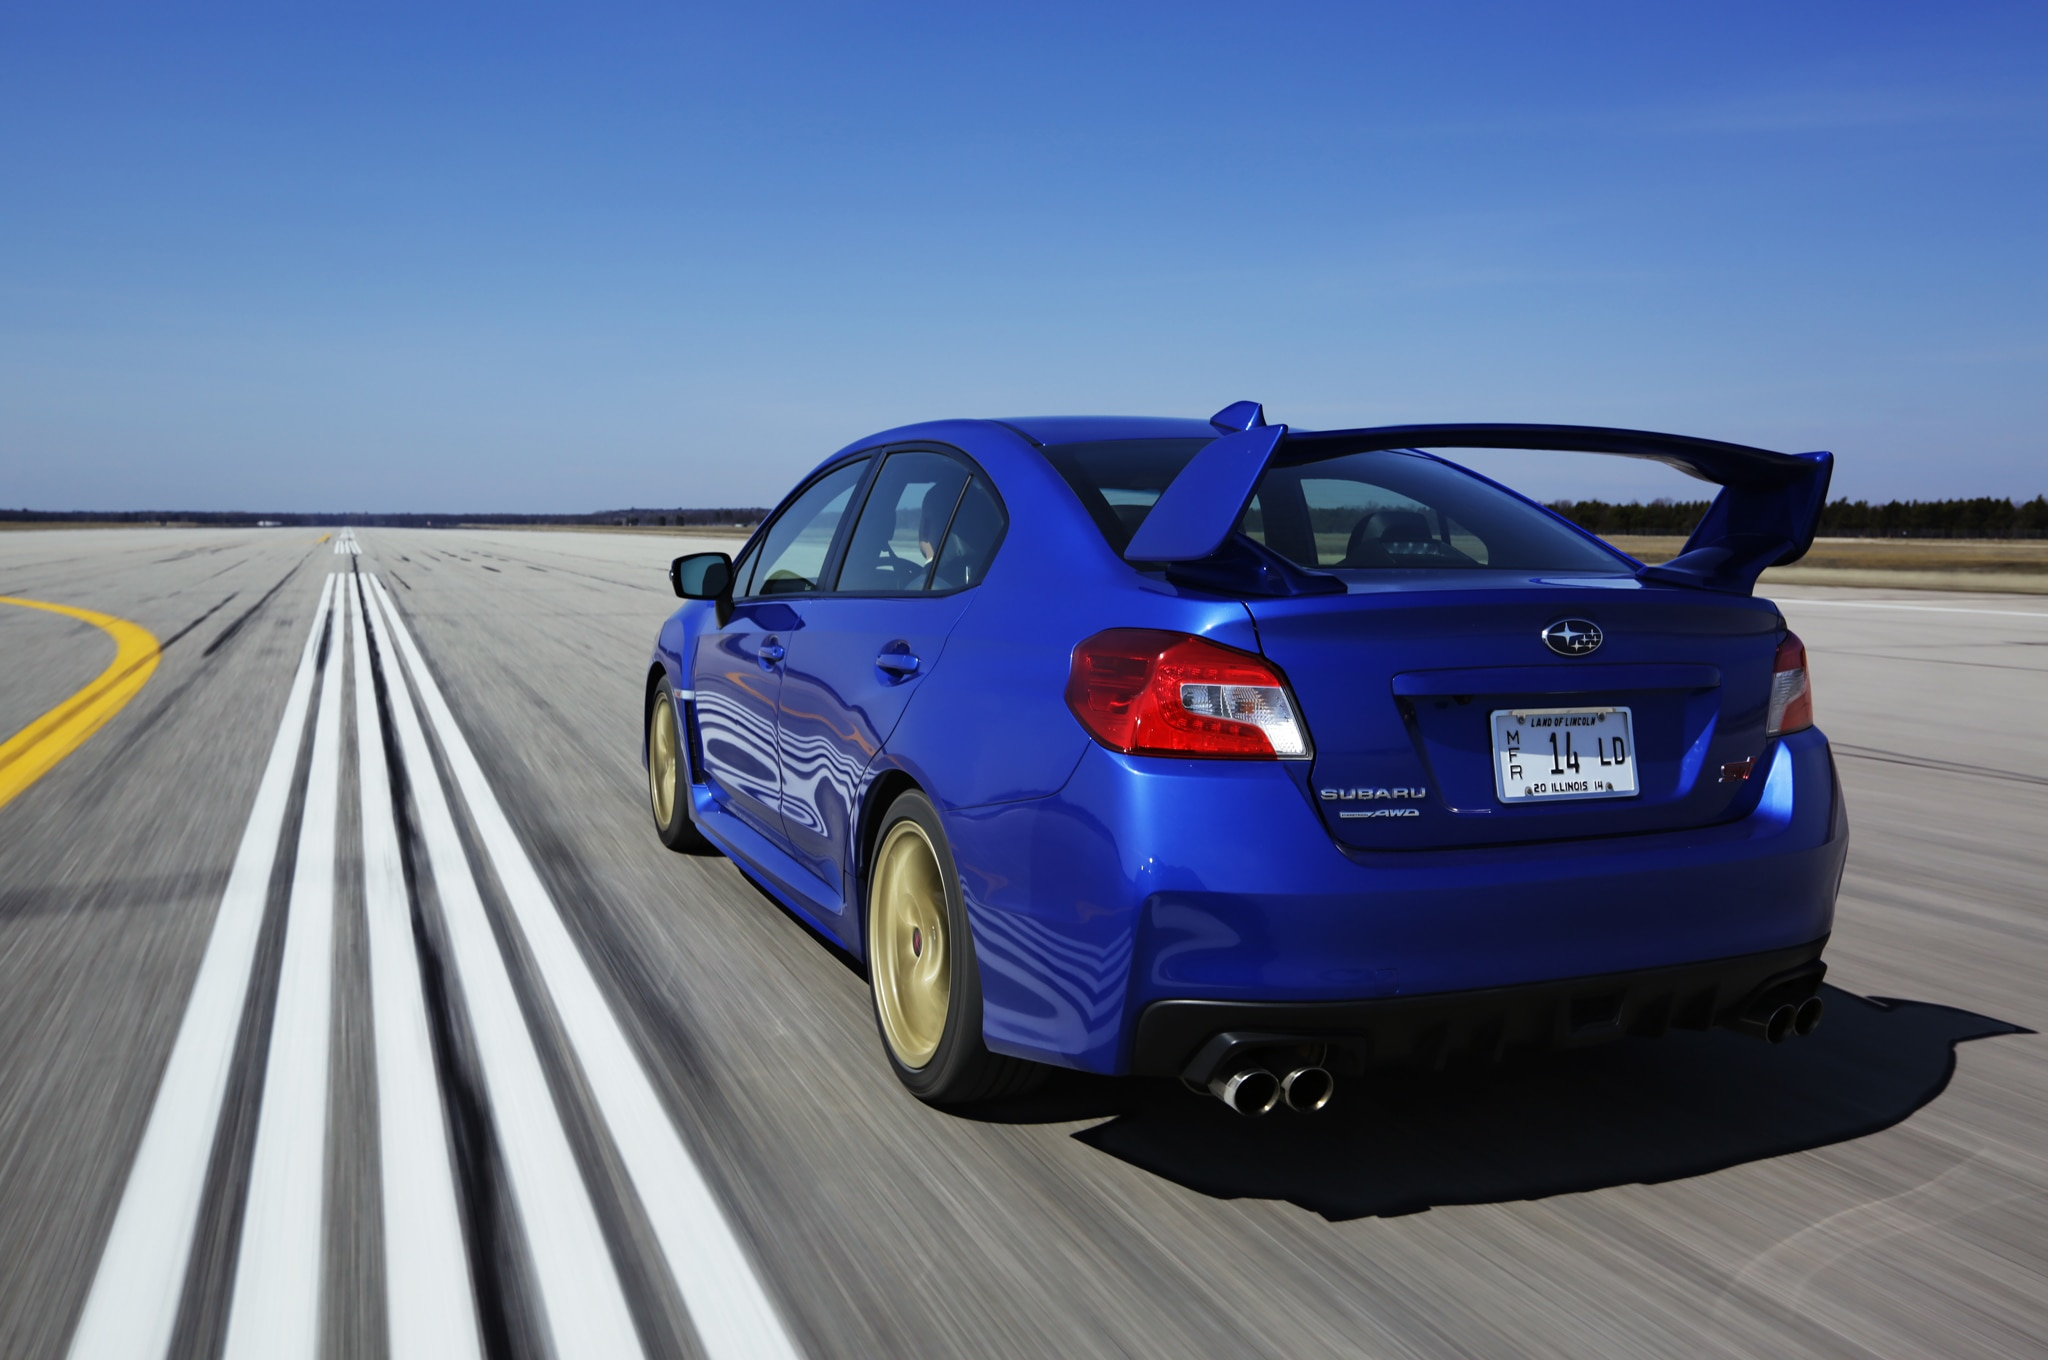 2015 Subaru Wrx Sti Rear Three Quarters In Motion